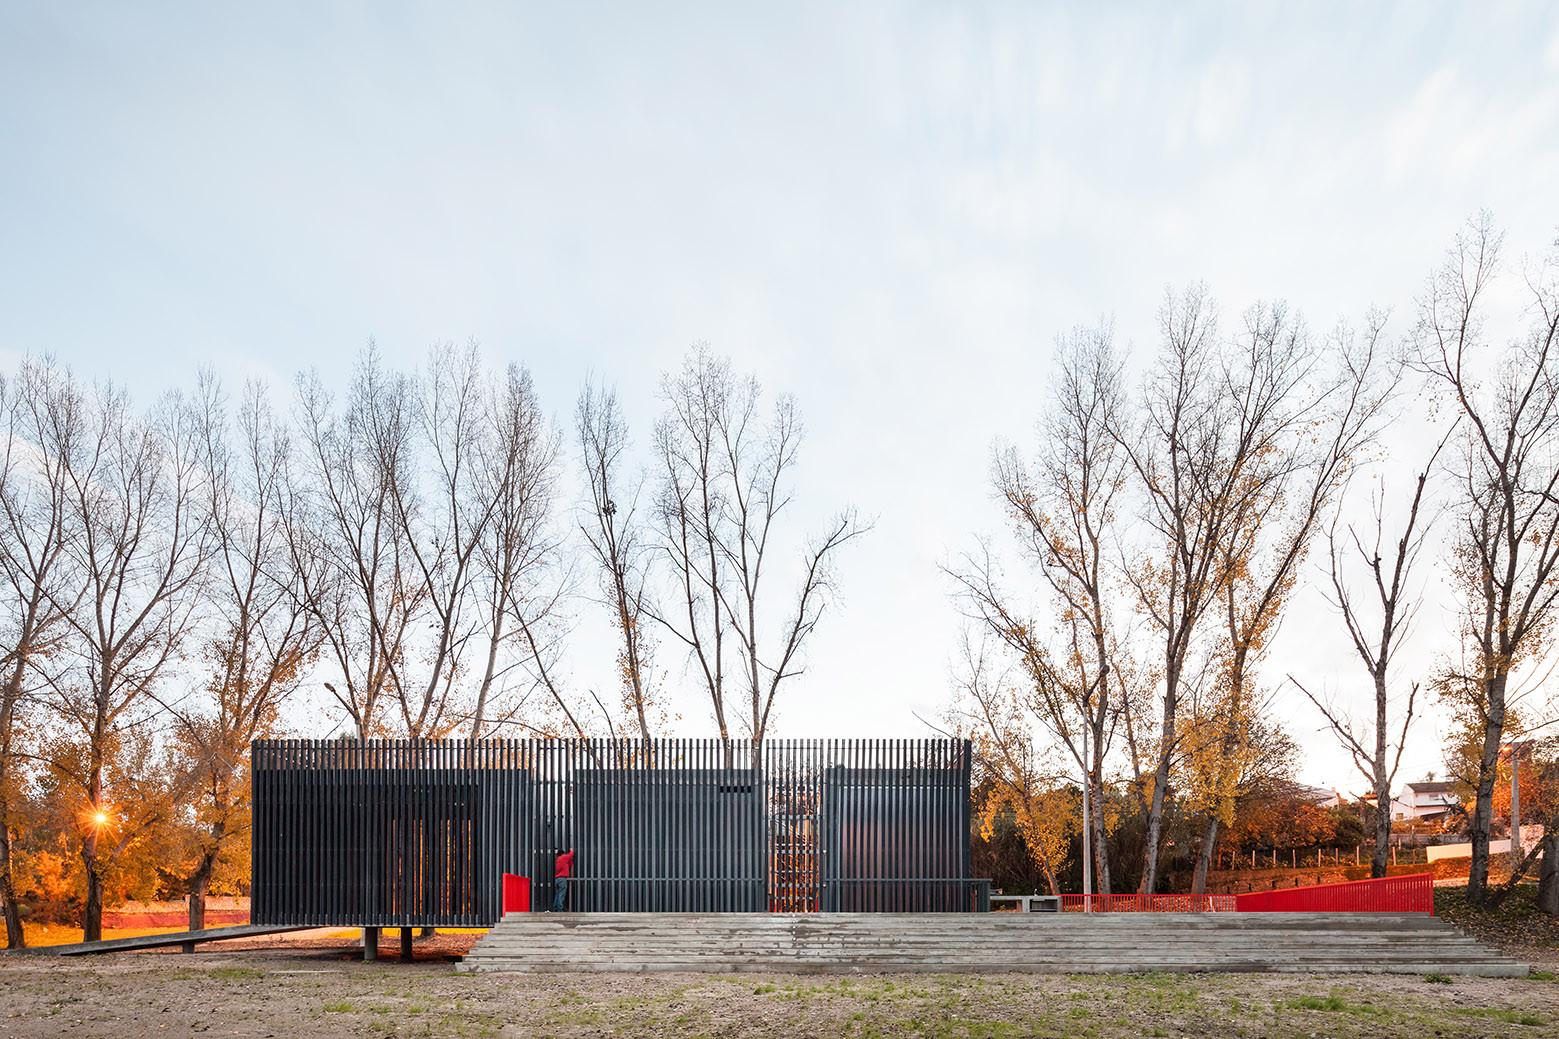 Alvega Canoeing Center / ateliermob, © Francisco Nogueira